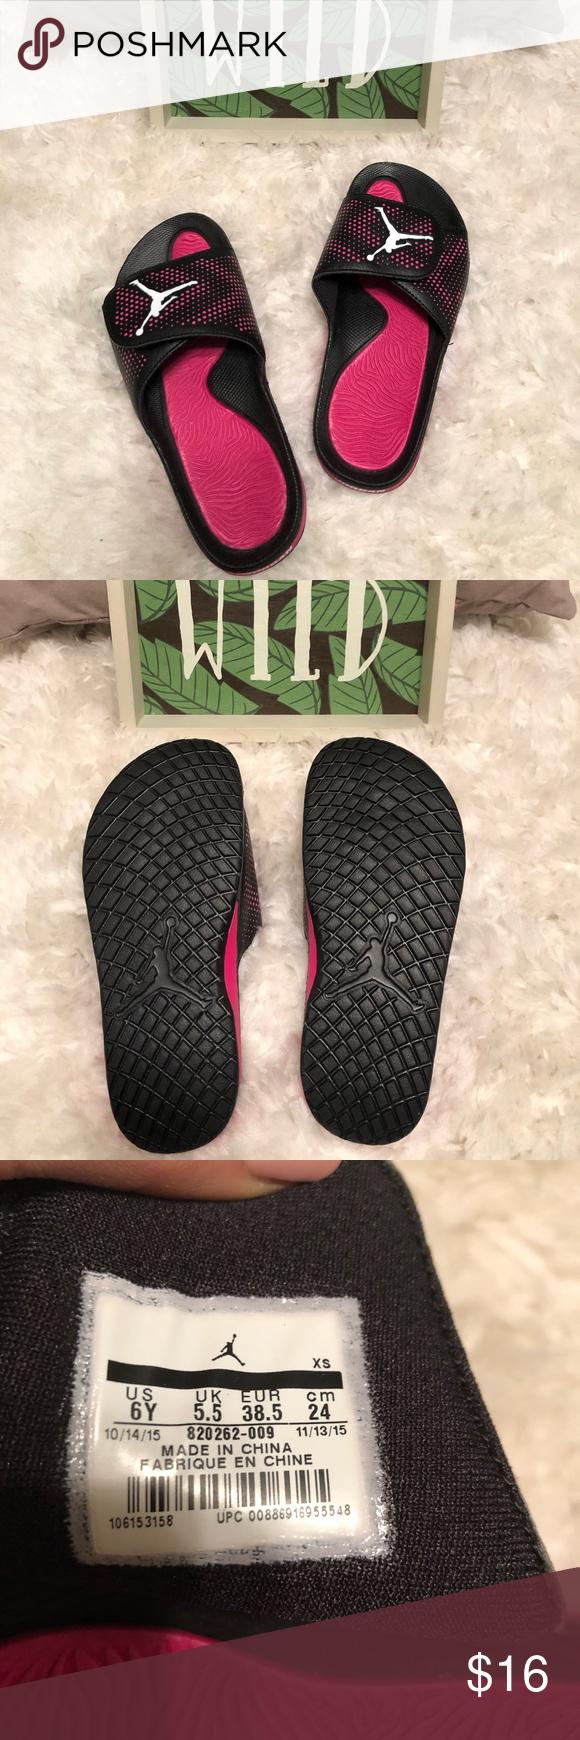 3ce47ff39f5 Jordan Slides-Brand New w/o Tag -Hot Pink & Black Jordan Slides ...